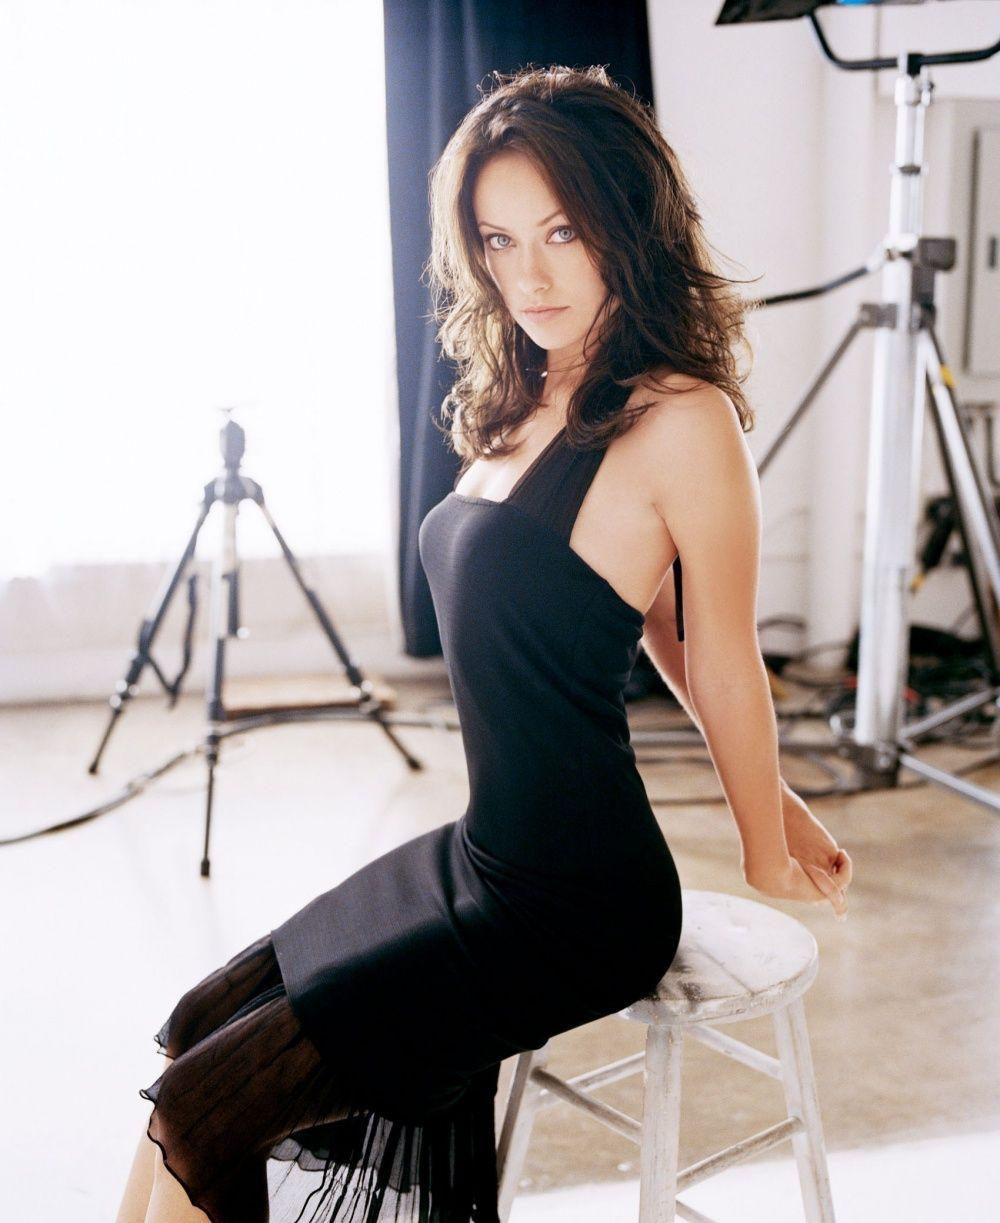 Olivia-Wilde US Actress Olivia Wilde Wiki Bio Age Top Weight Scorching Bikini Photographs